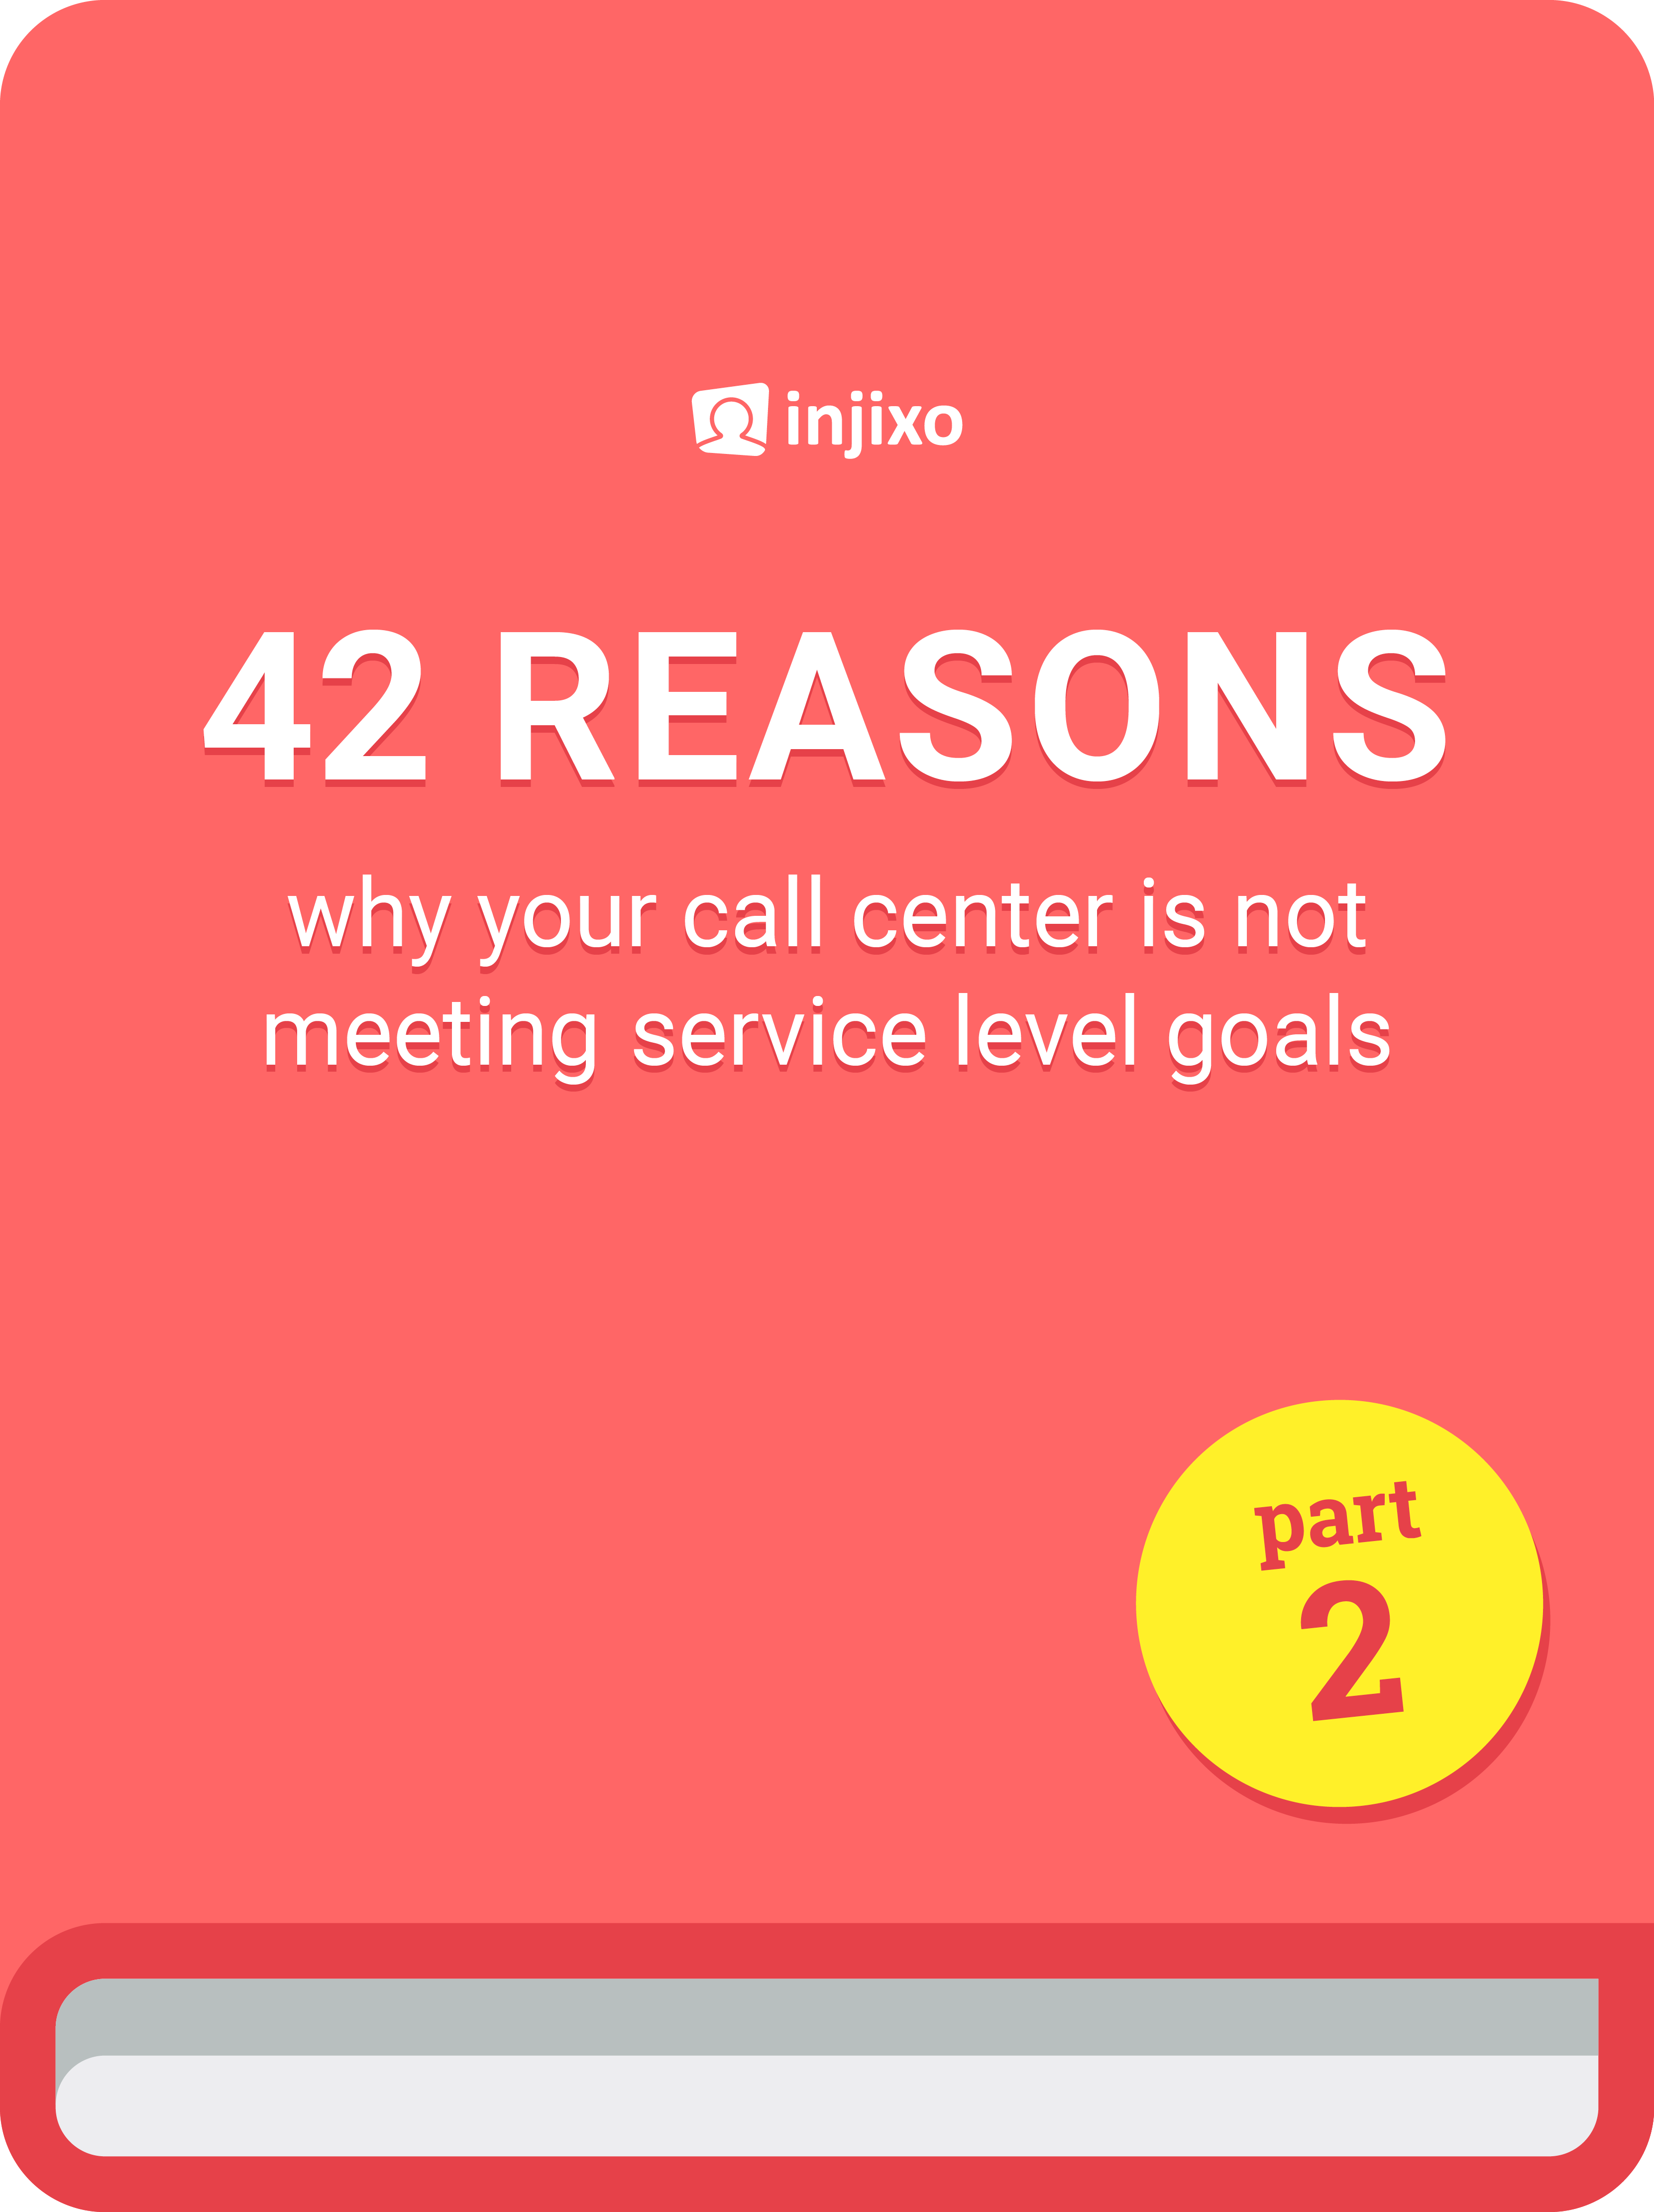 injixo-en-ebook-successful-service-level-part2